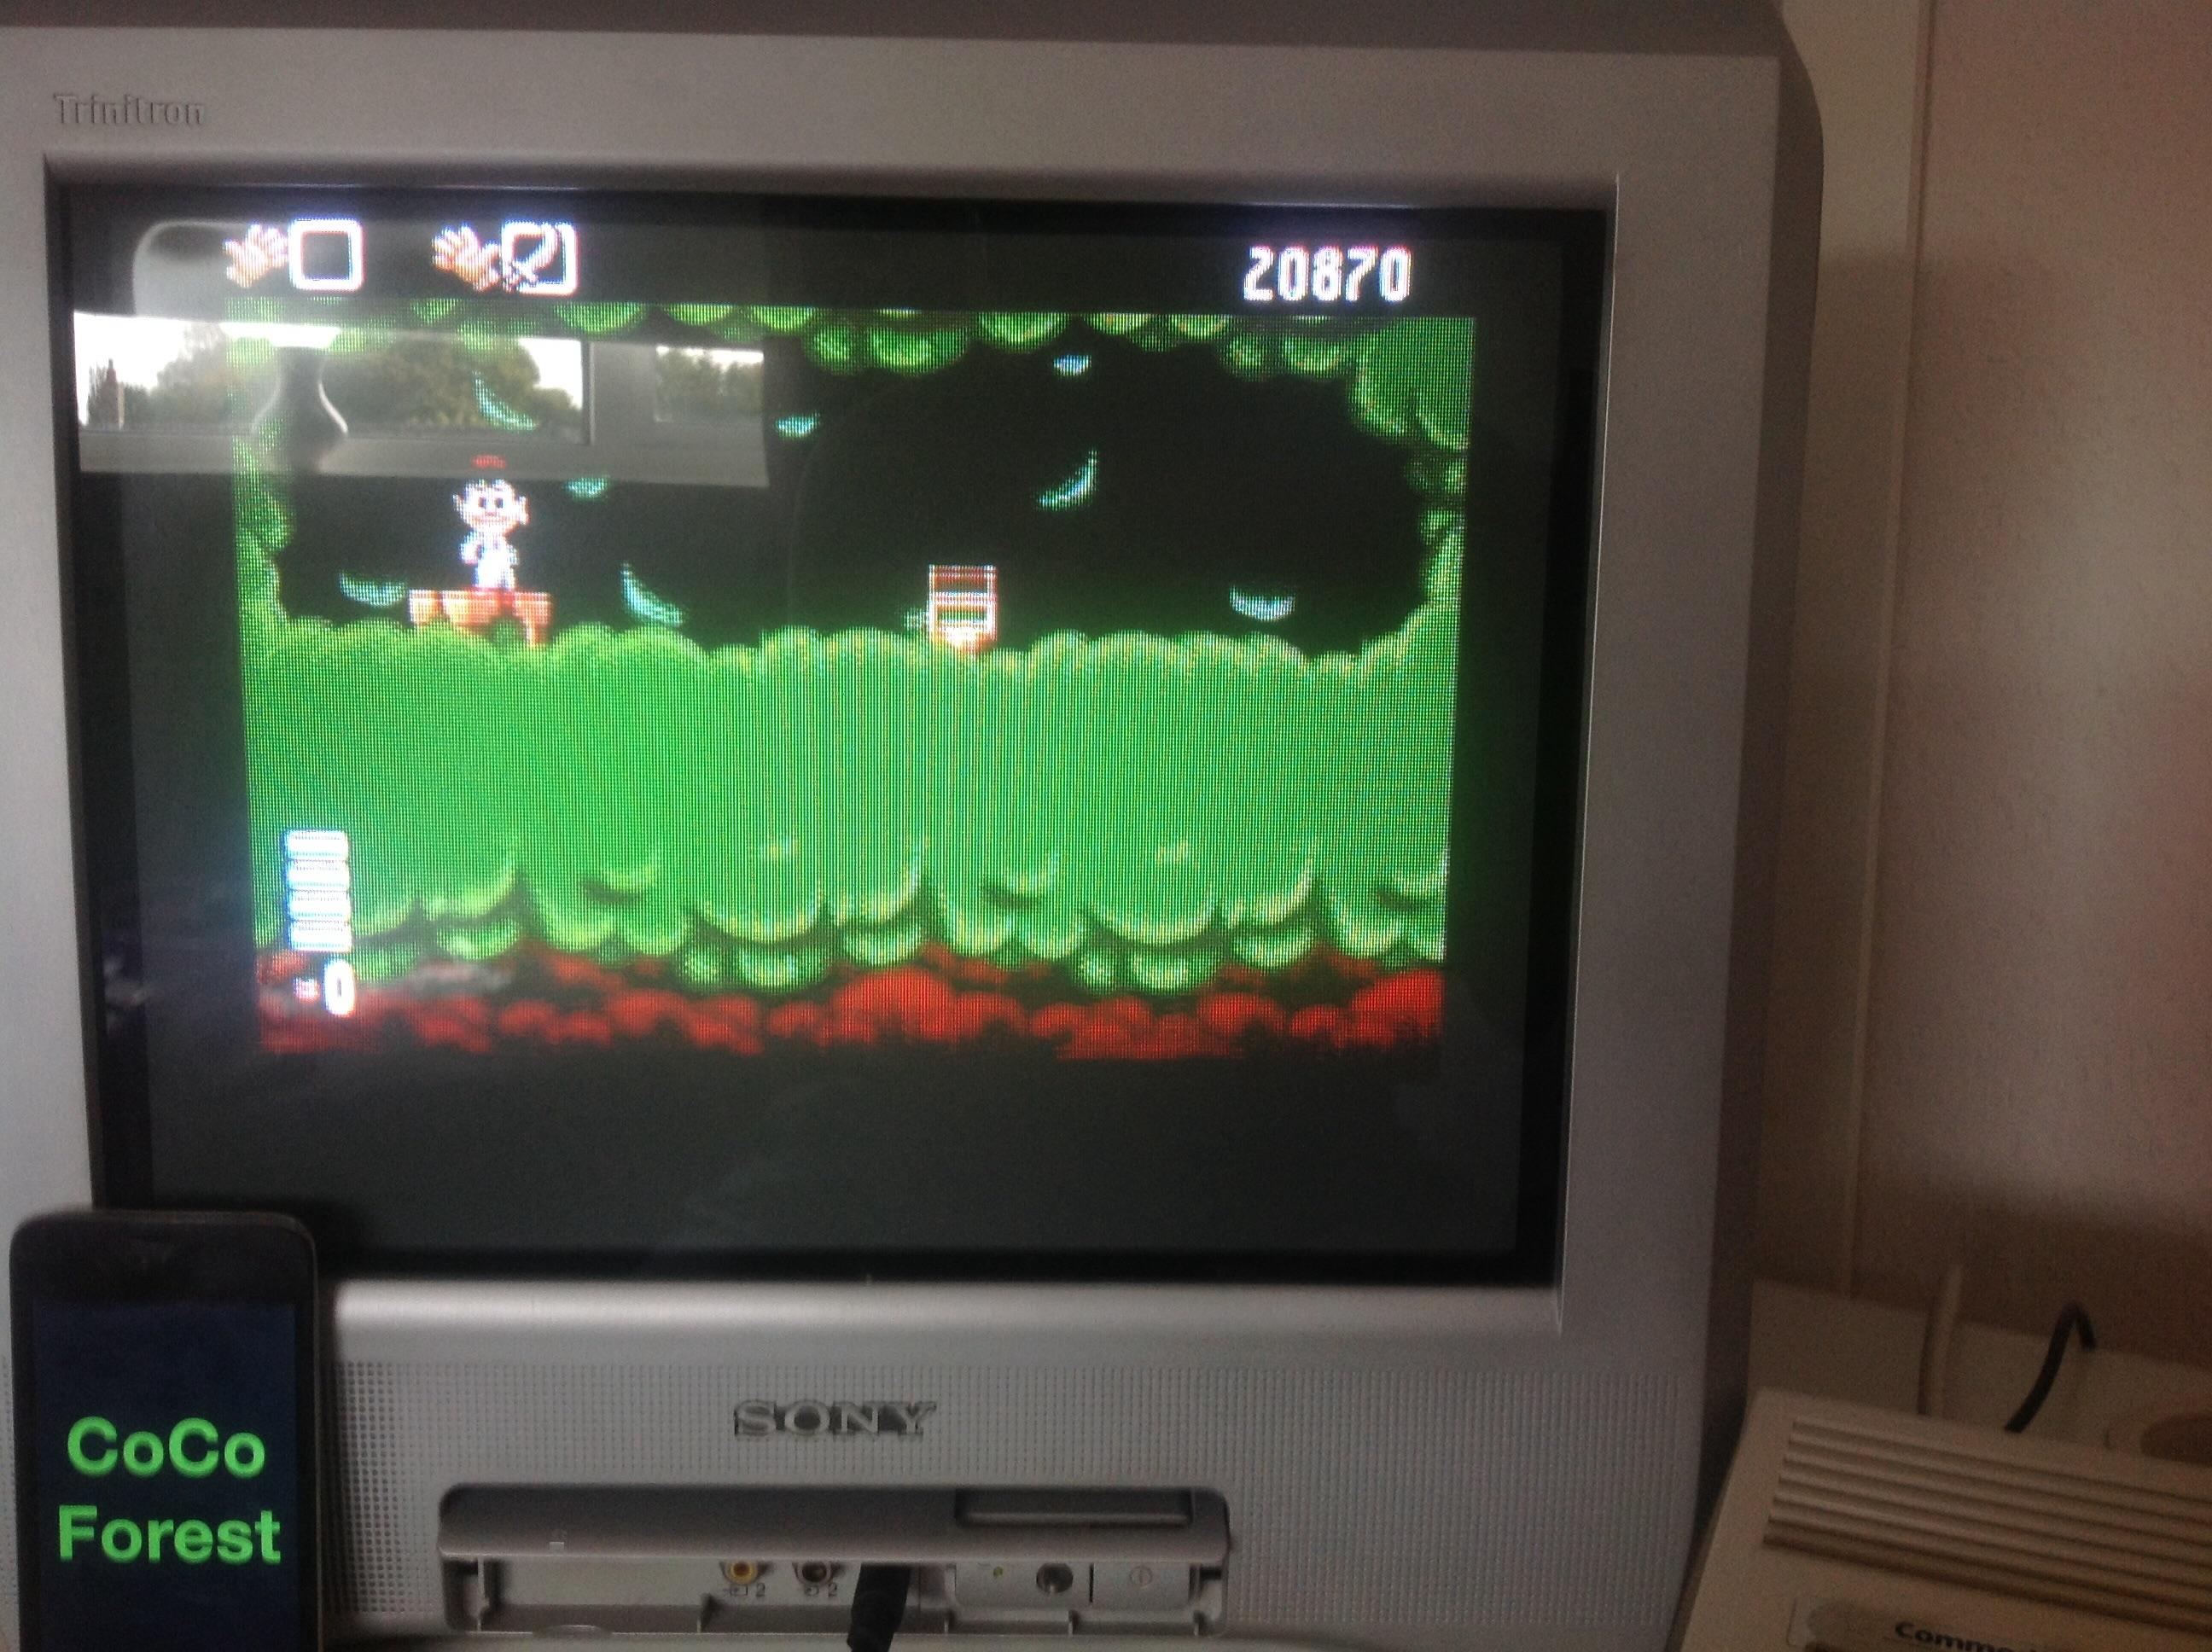 CoCoForest: Arabian Nights (Amiga) 20,870 points on 2014-09-28 07:55:14